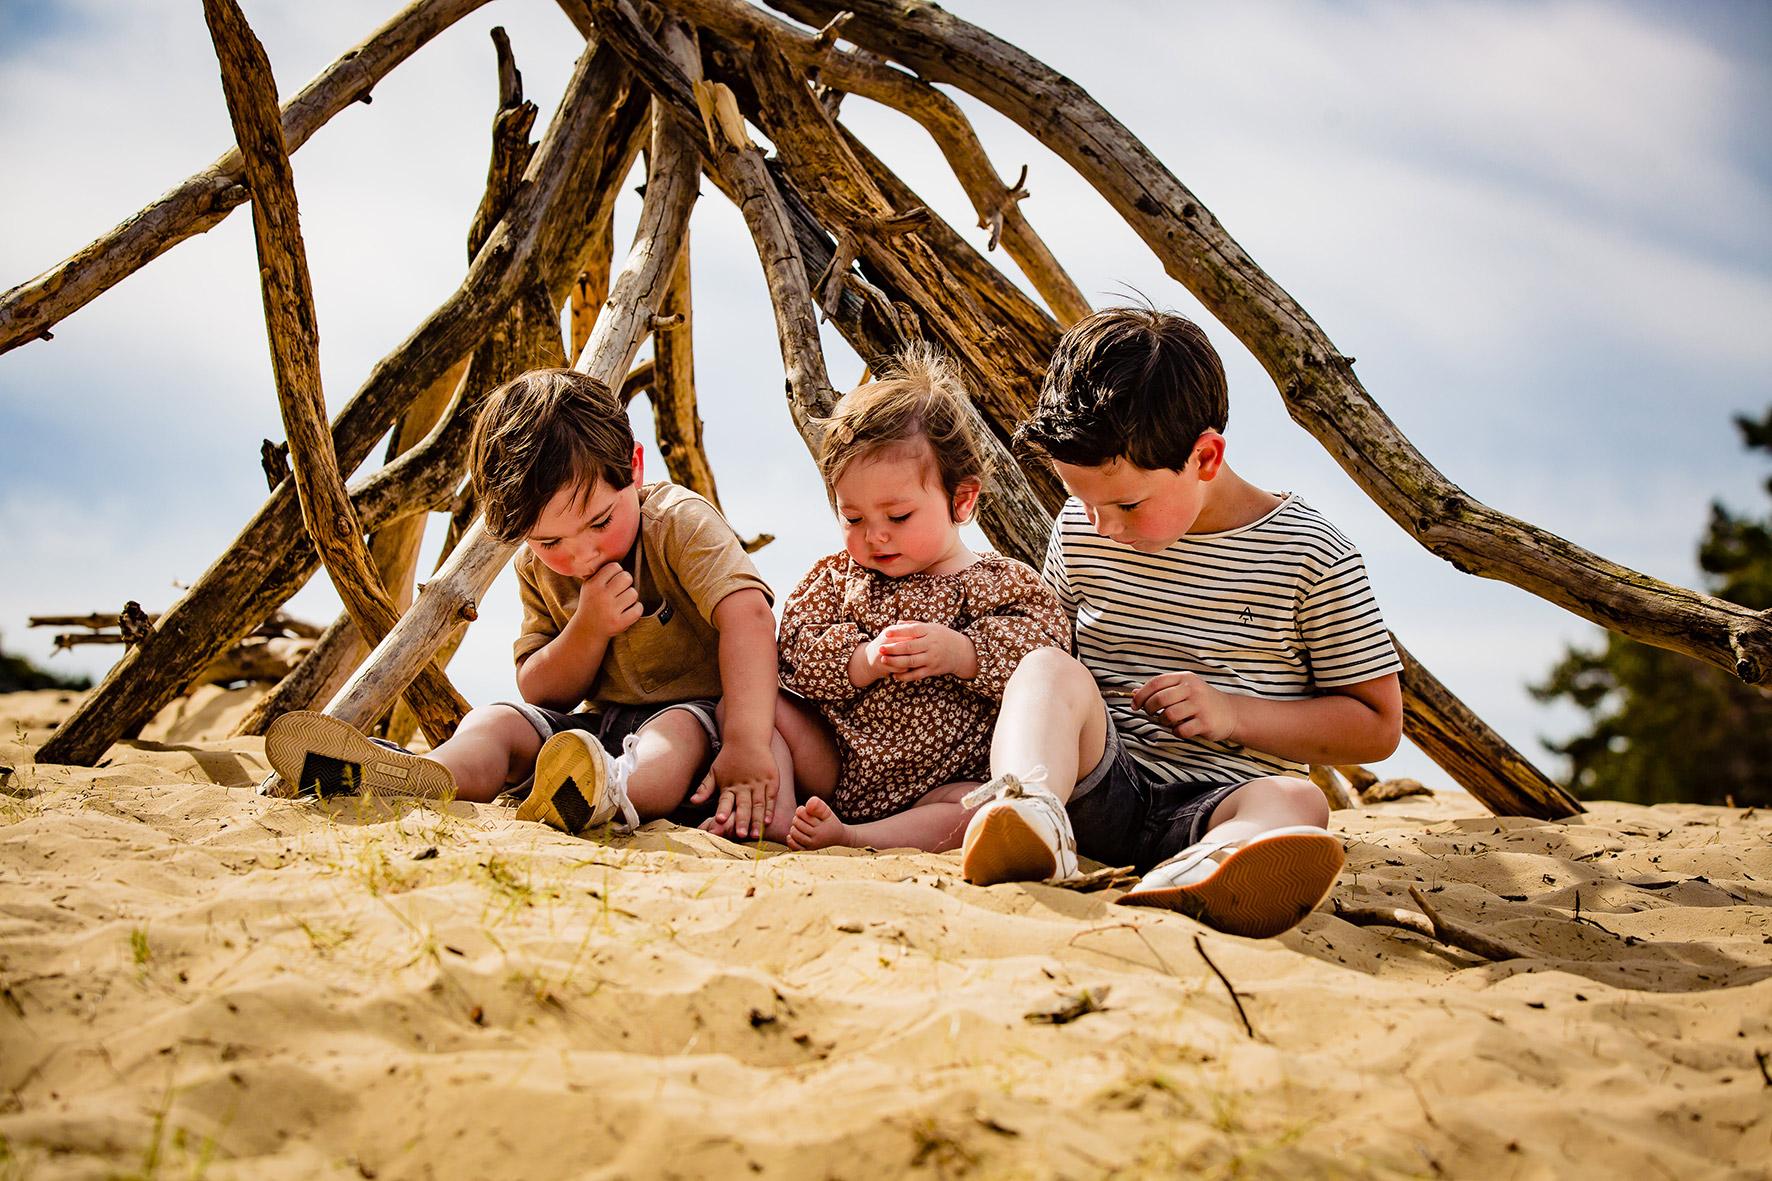 Familie fotoshoot op locatie, Familie Fotoshoot Wekeromse Zand, fotoshoot Ede, portretfotografie Ede